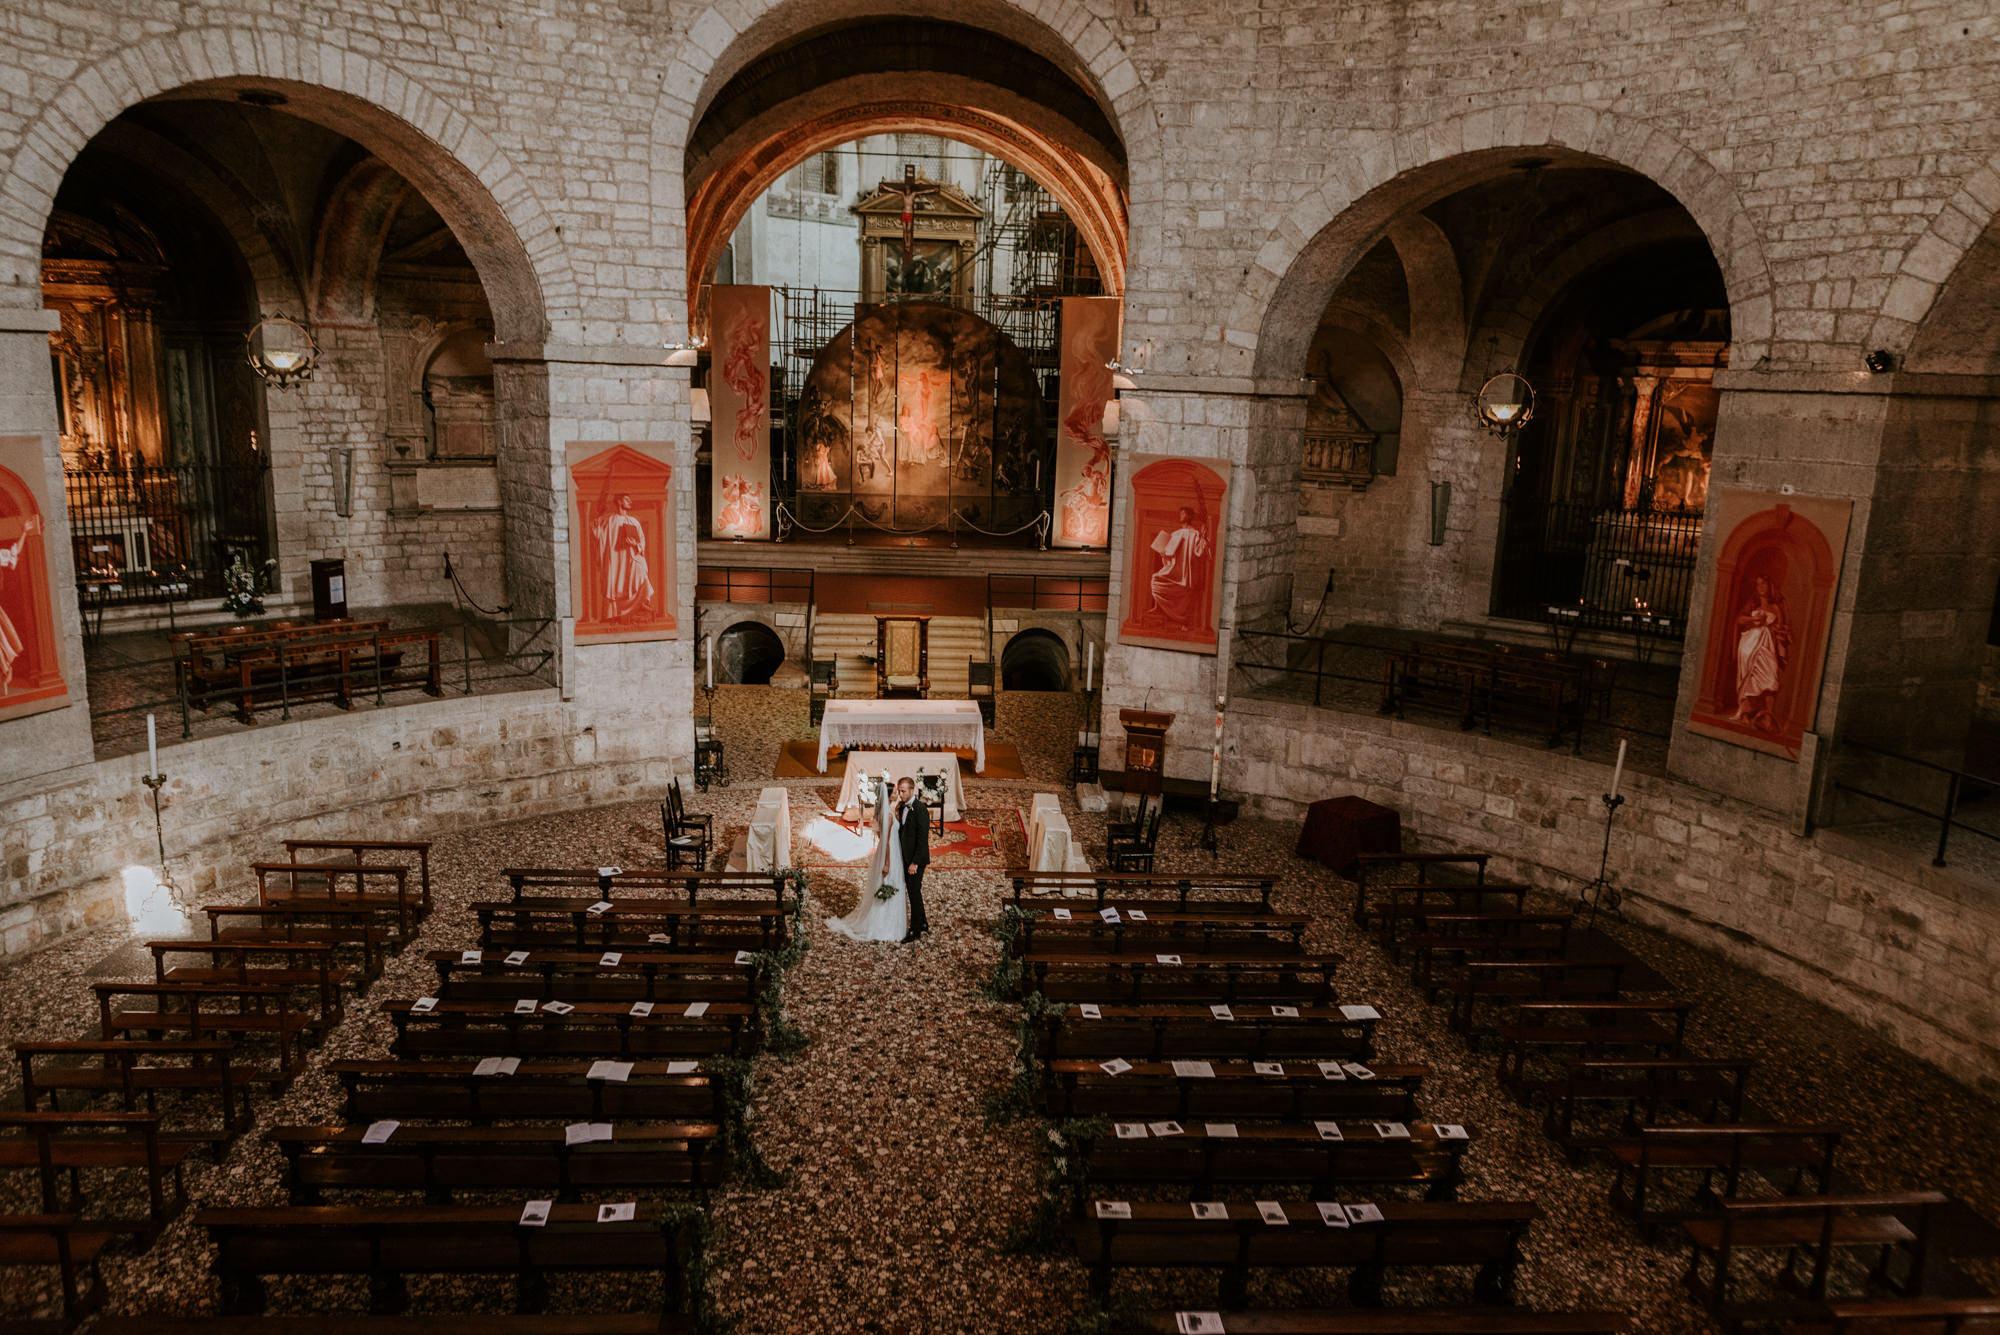 FOTO+PHOTO+BODA+WEDDING+ITALIA+ITALY+MAURICIO+GARAY+MAURICIOGARAY+WEDDINPHOTOGRAPHER+FOTOGRAFODEBODA-1043.jpg